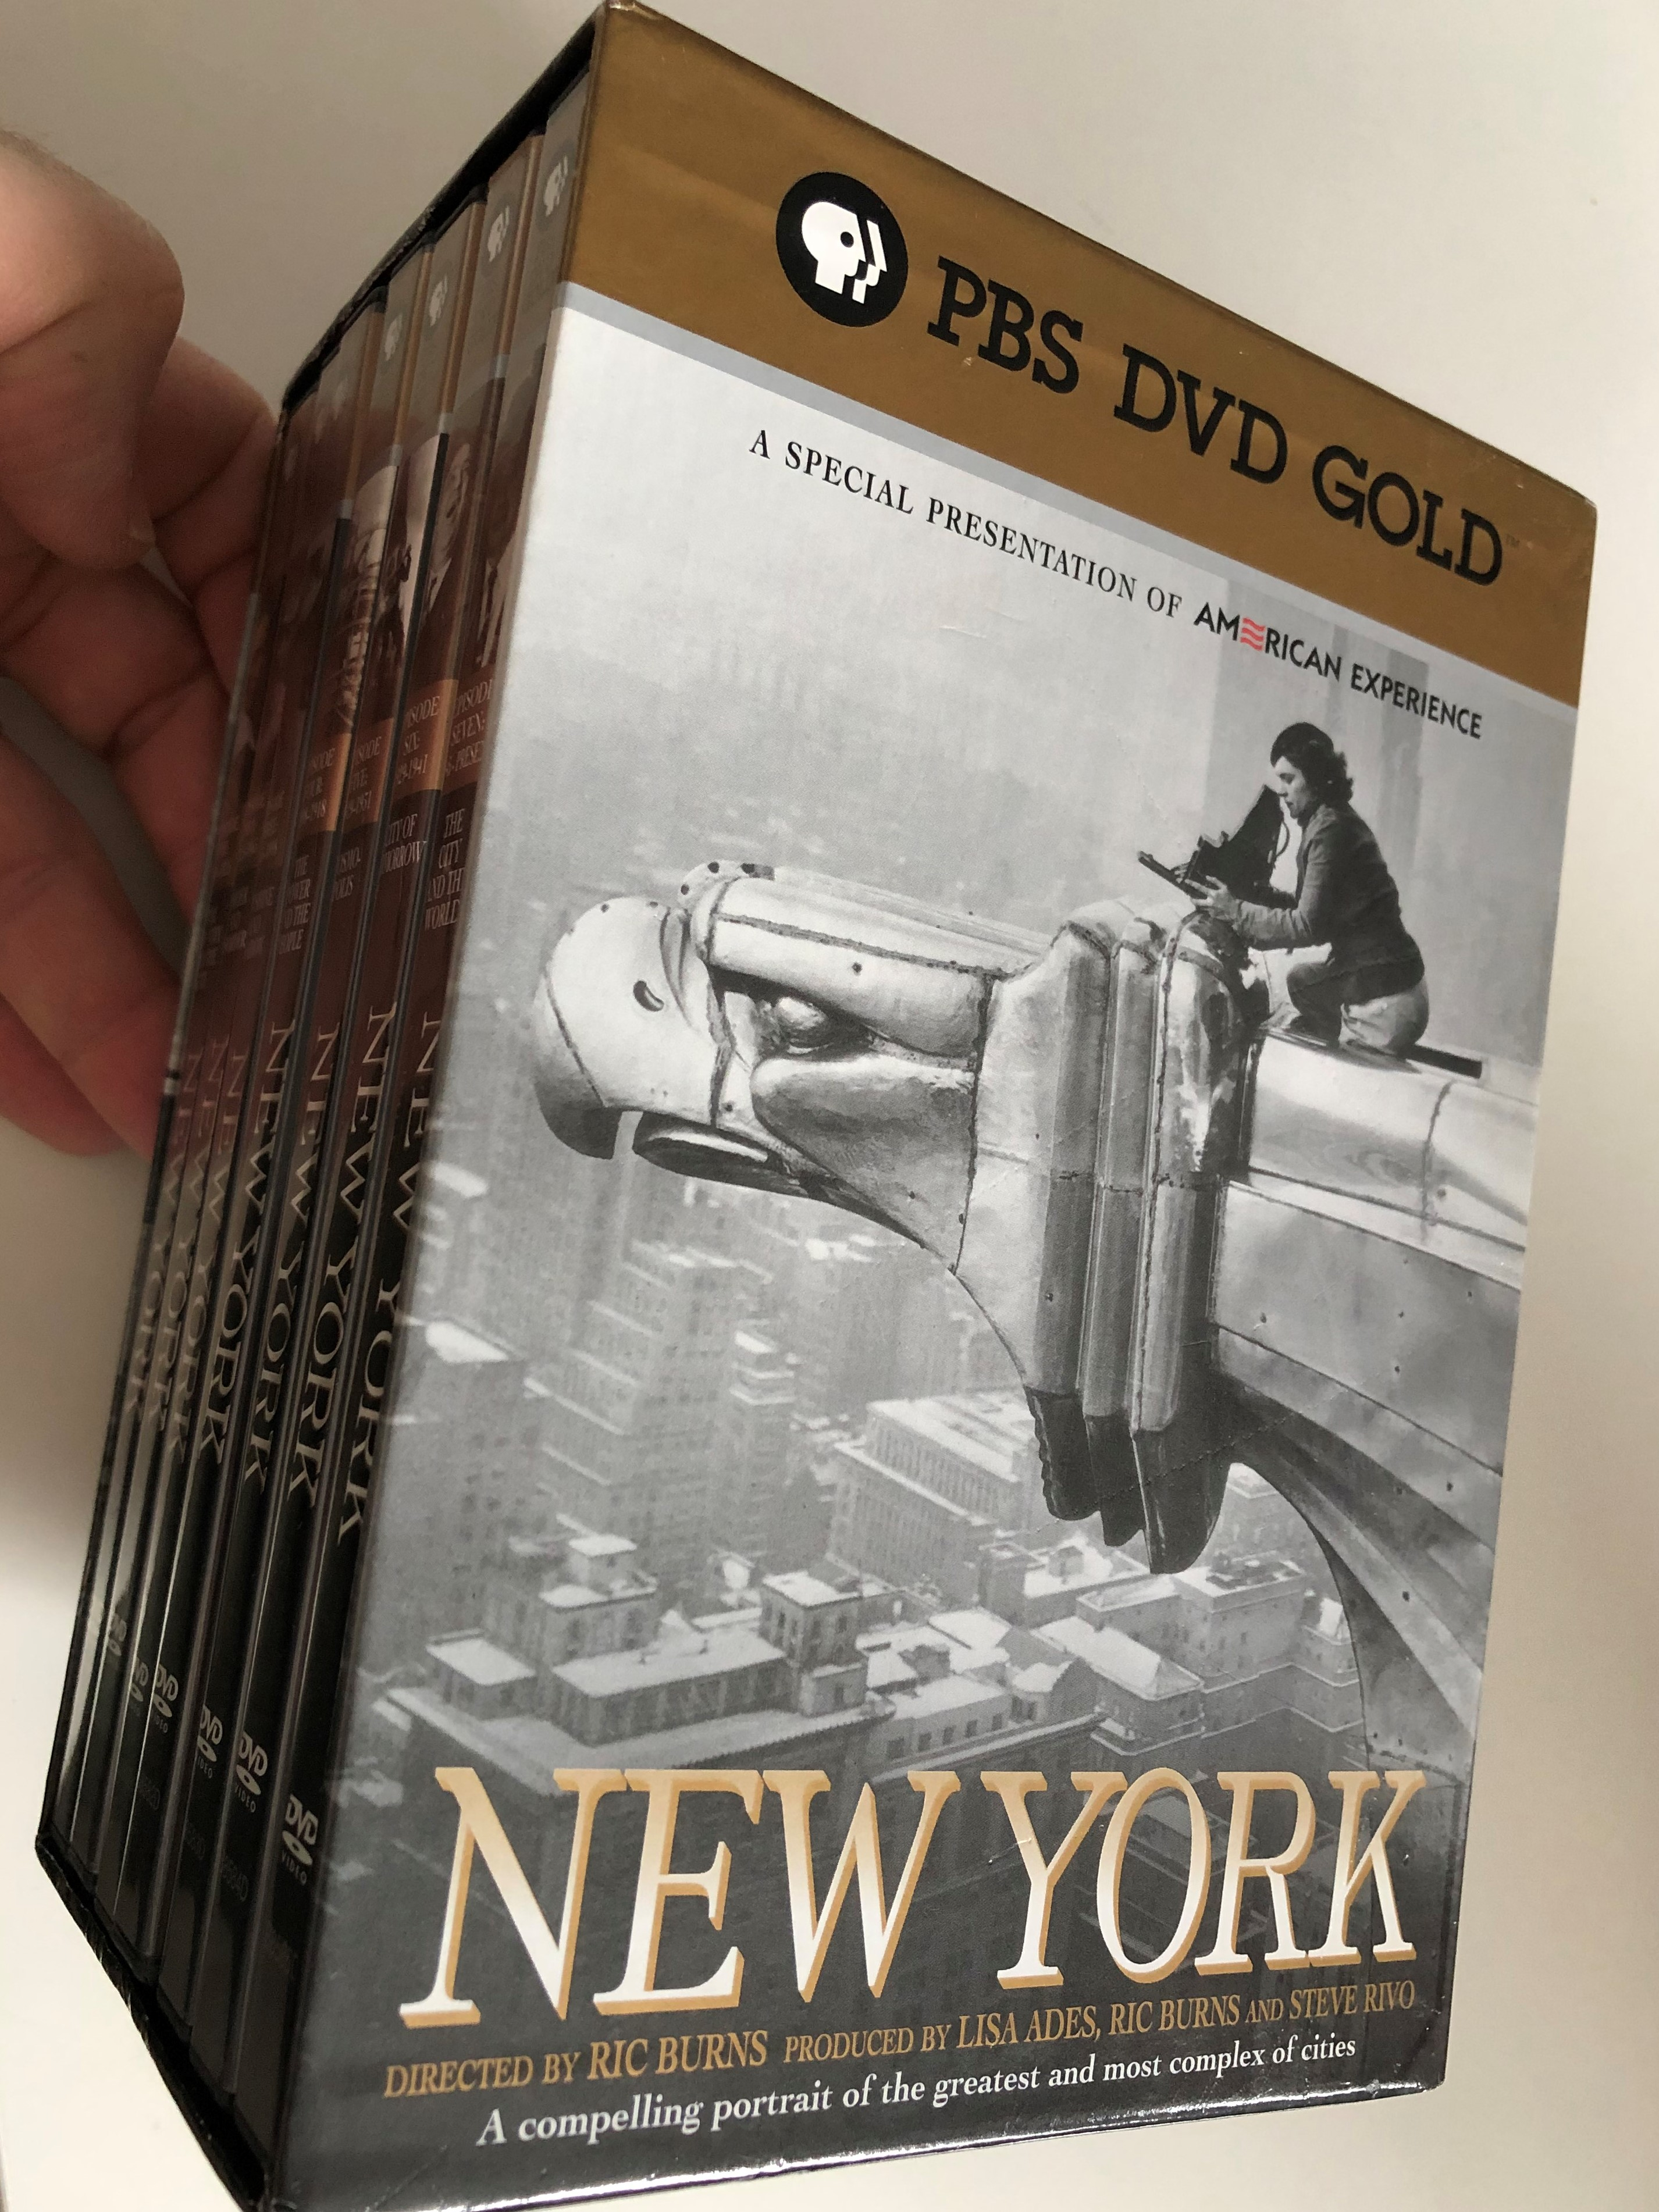 new-york-documentary-dvd-box-1999-directed-by-ric-burns-1.jpg